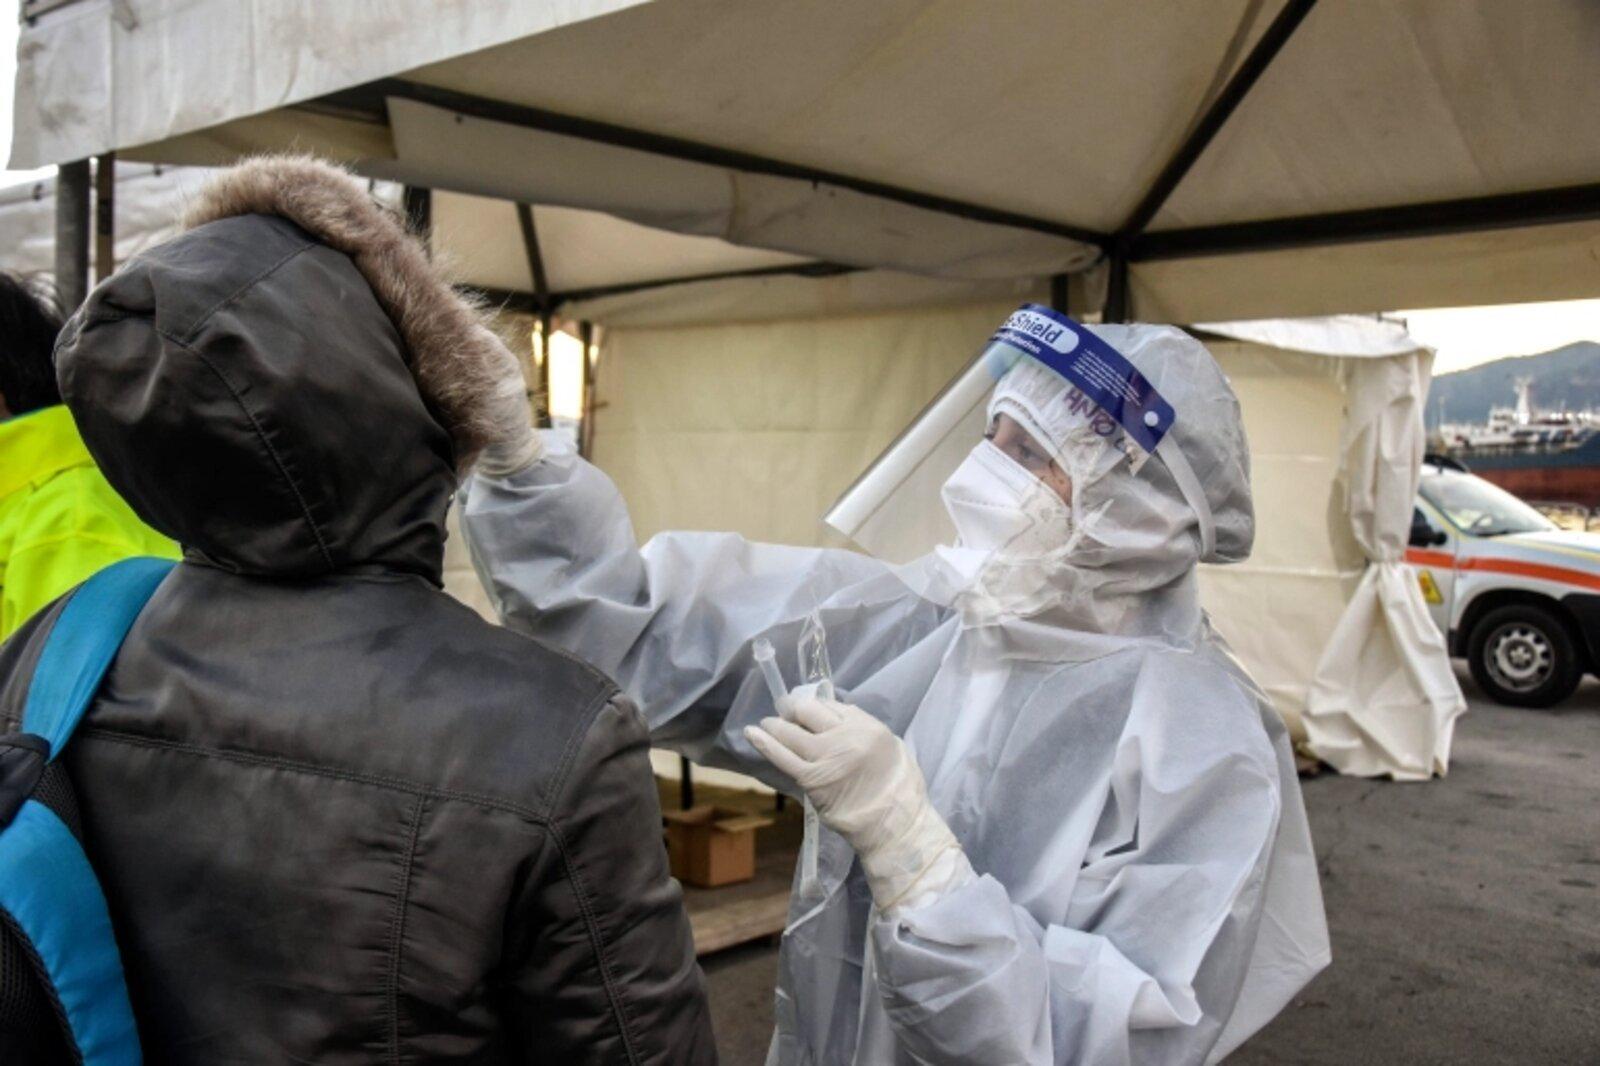 London on lockdown amid scare of new virus strain